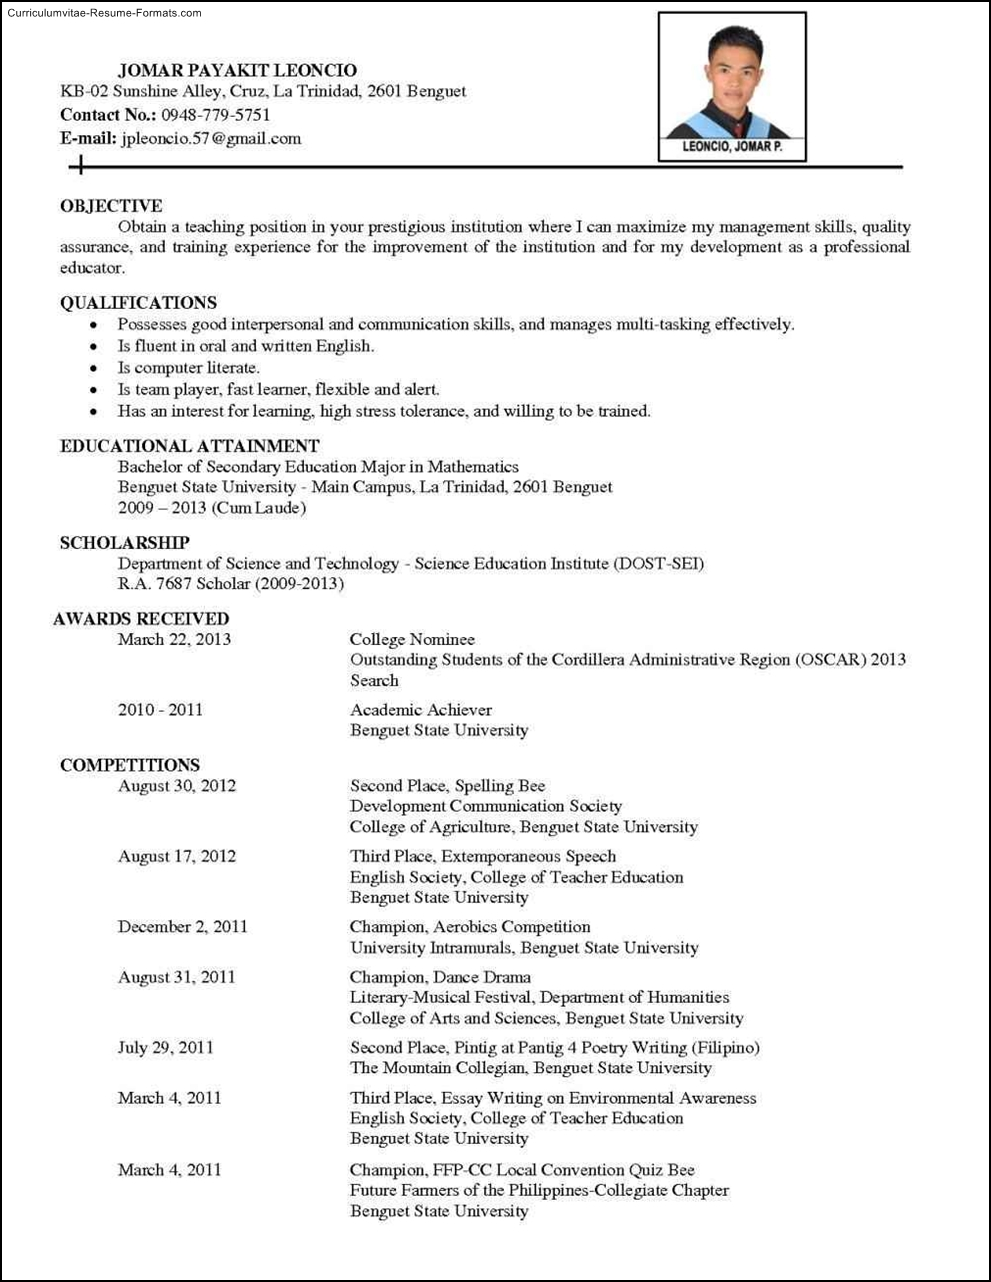 comprehensive curriculum vitae sample